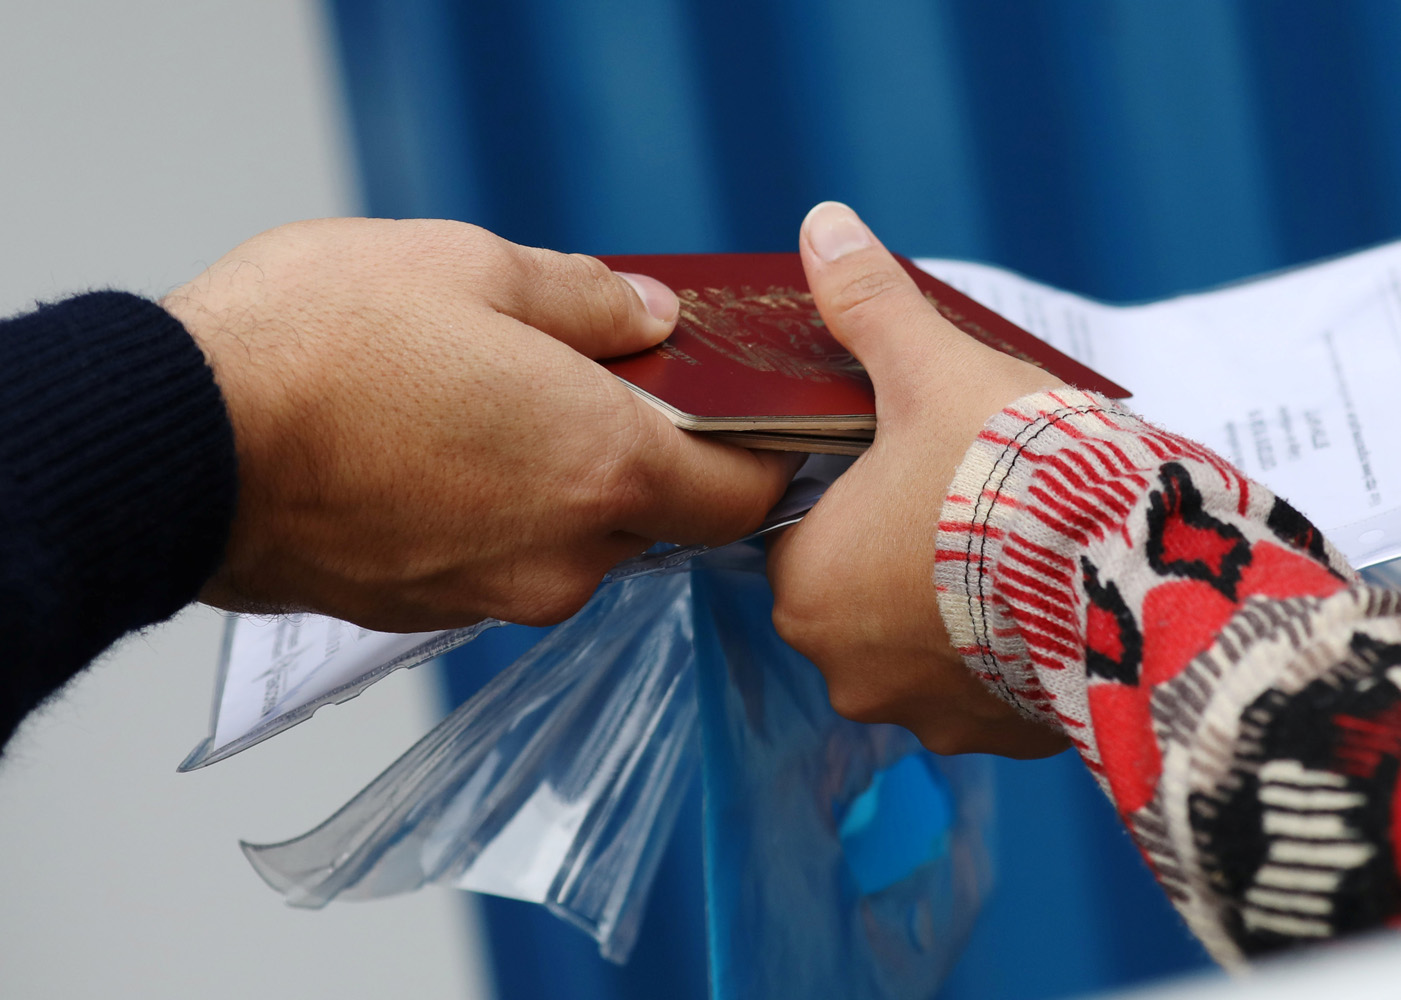 Comisión Presidencial para las Relaciones Exteriores informó sobre países que aceptan pasaporte vencido